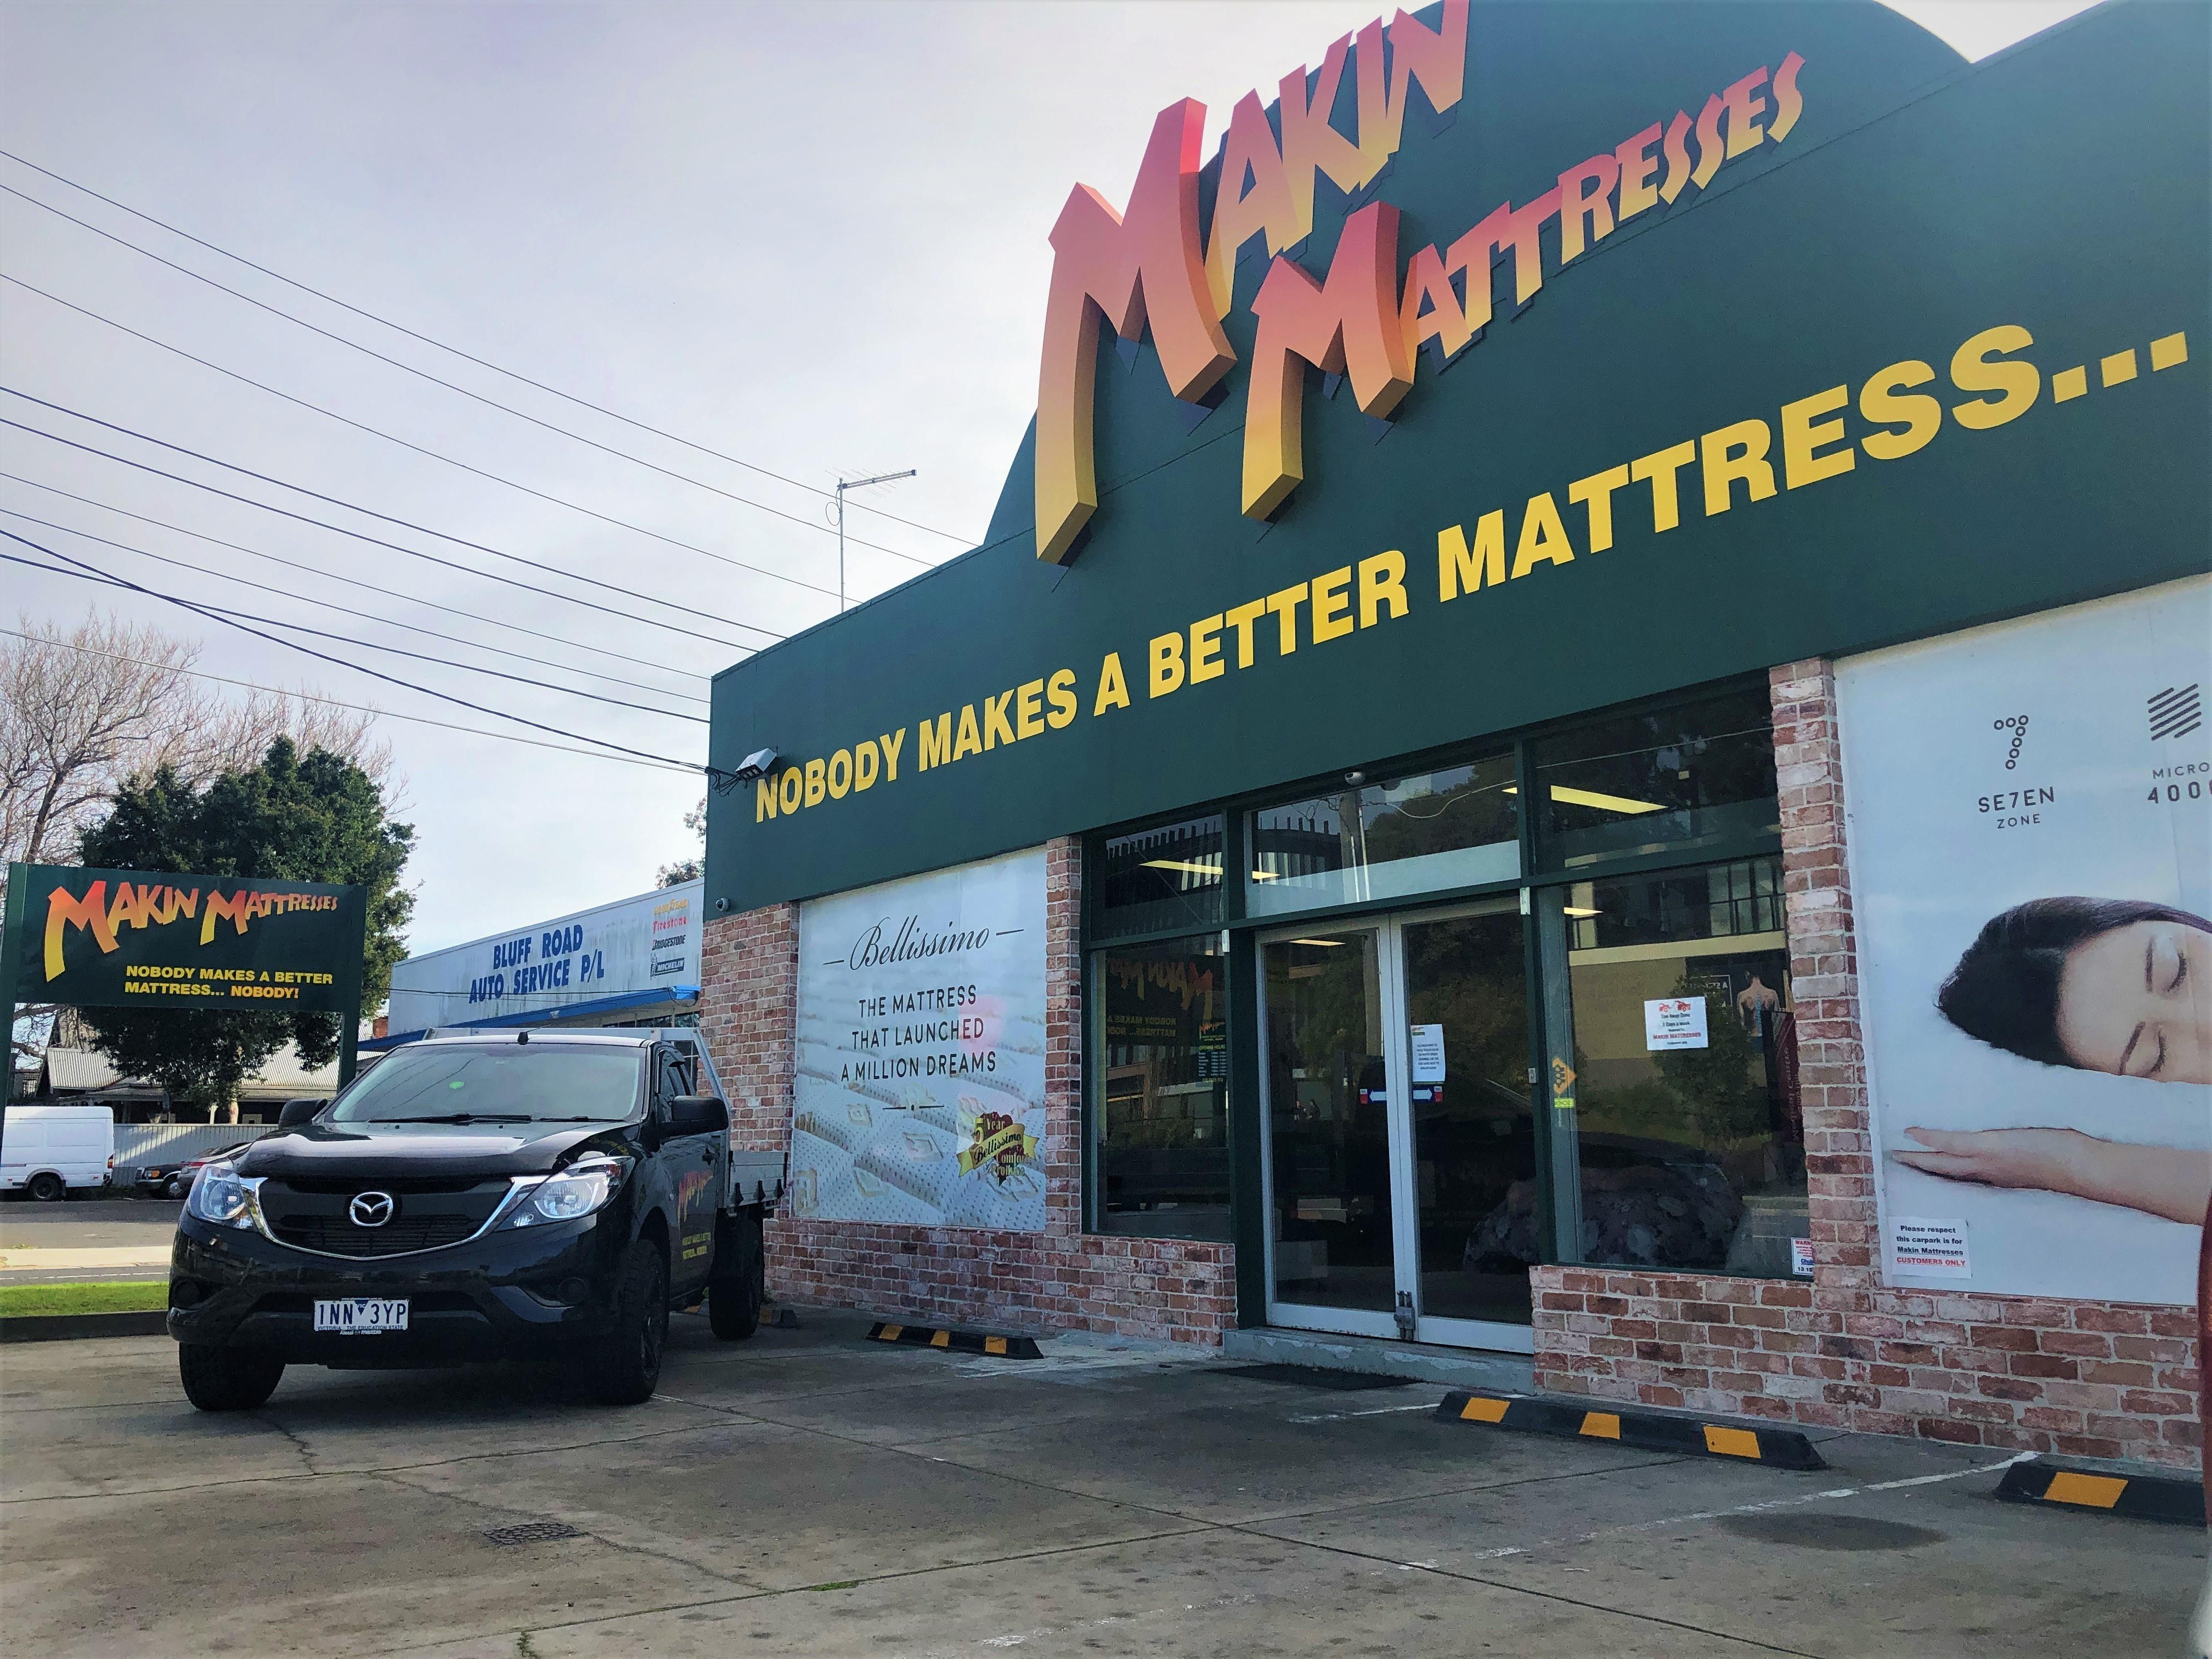 makin mattresses mattress store Melbourne